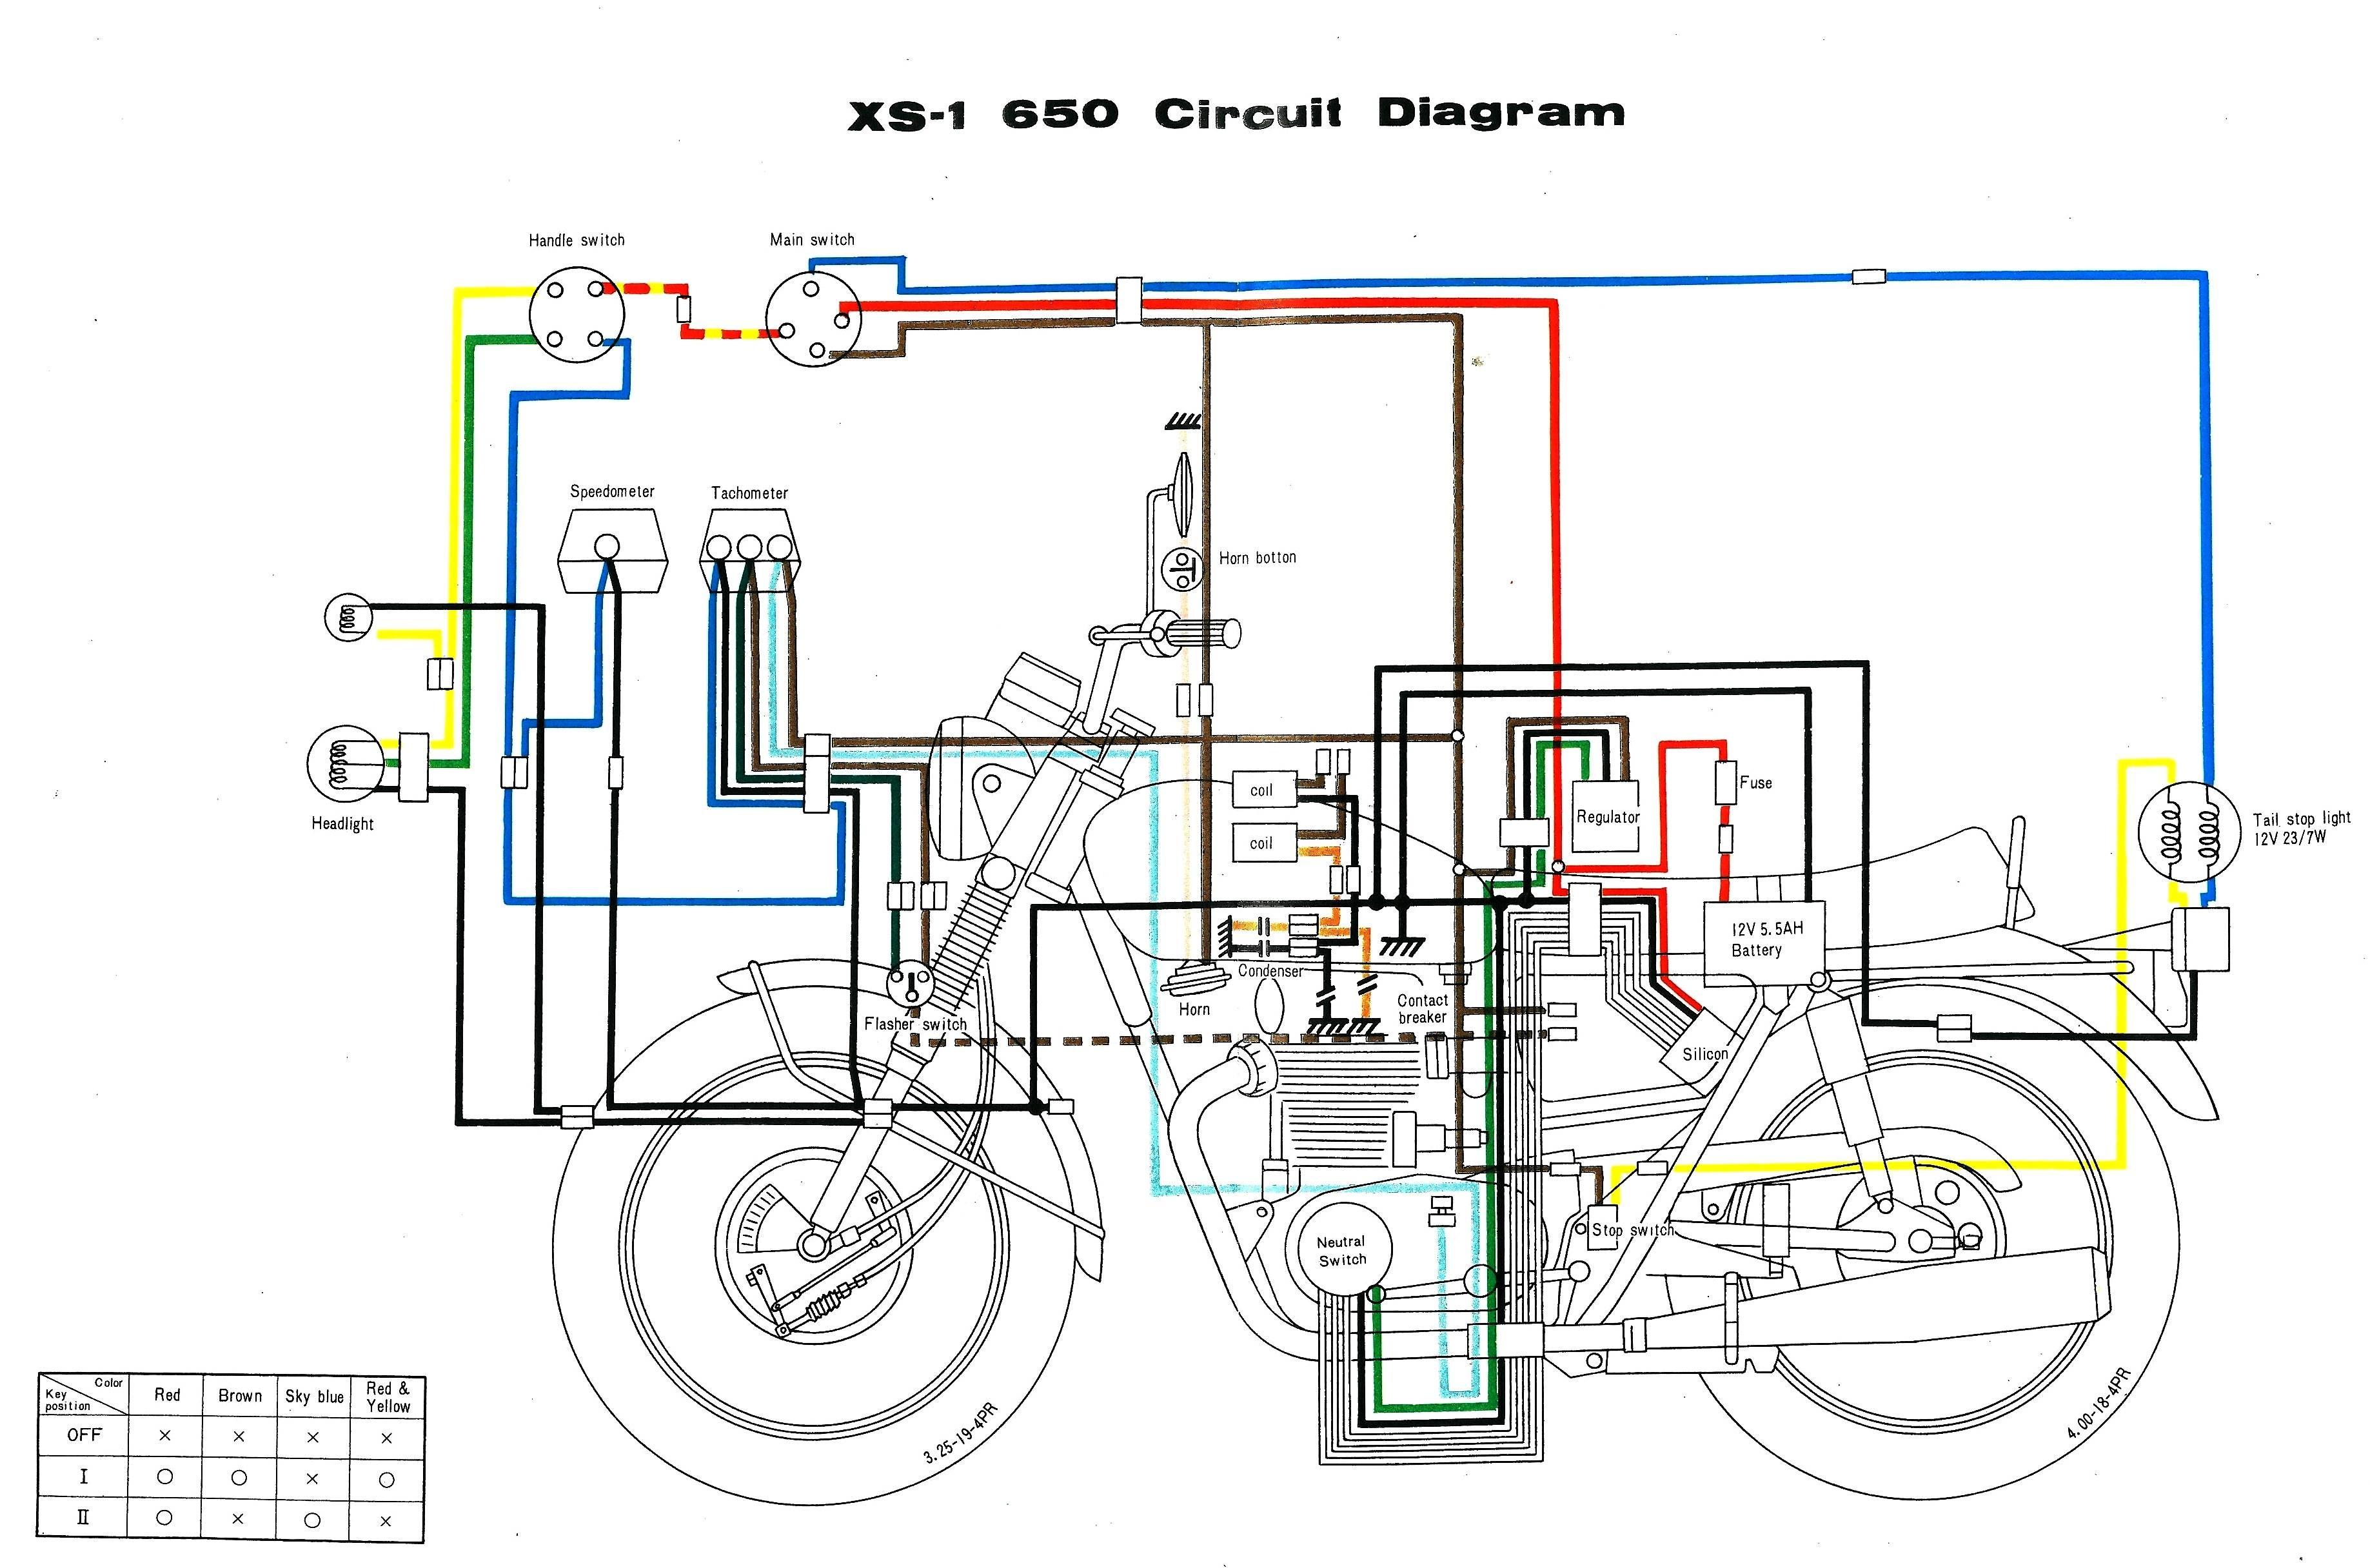 OW_7016] Honda Motorcycle Wiring Diagrams Wiring Diagram Download DiagramSapre Oxyt Olyti Socad Stic Jebrp Dome Kapemie Ndine Joami Hyedi  Mohammedshrine Librar Wiring 101